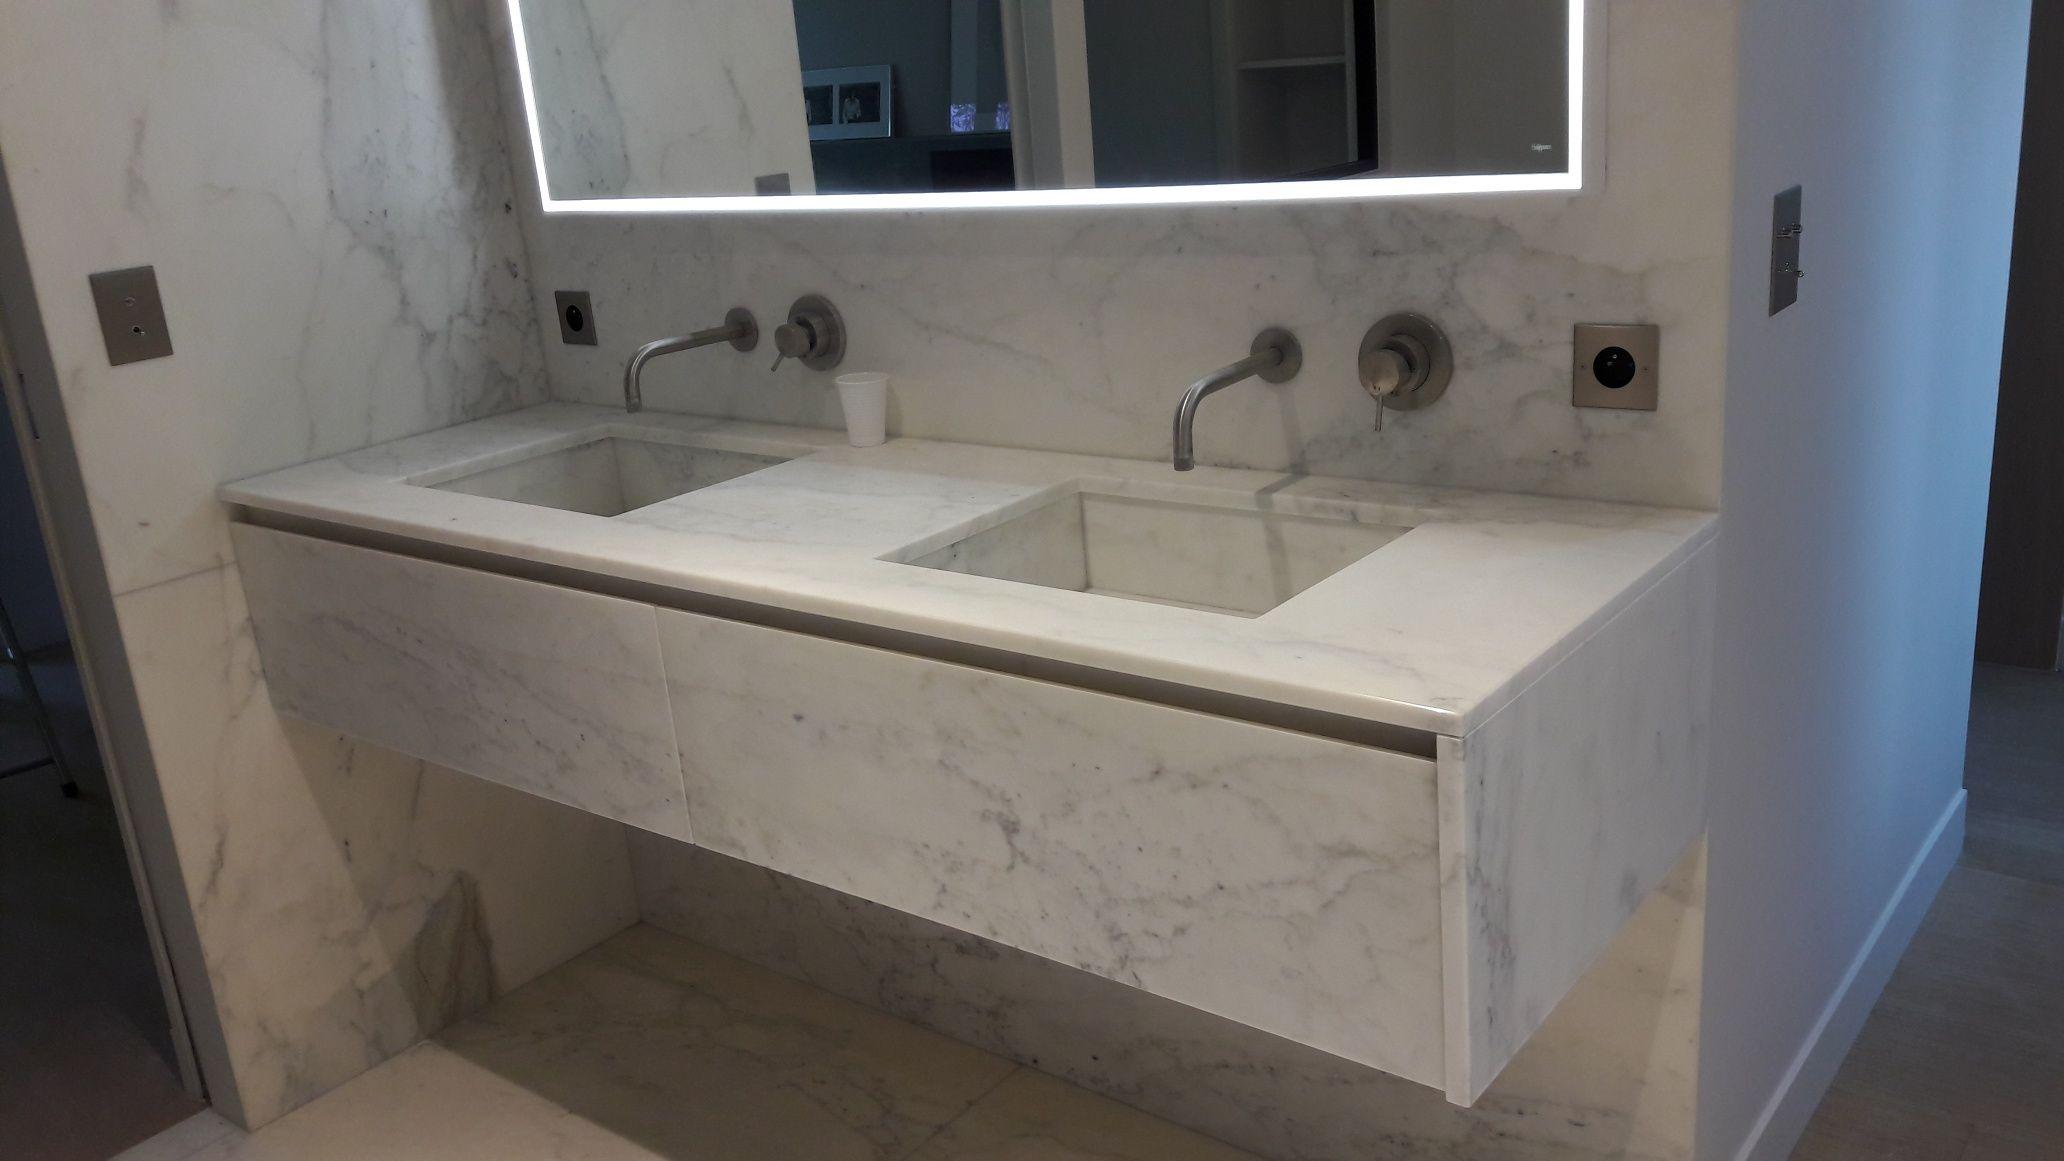 Meuble Avec Plan Vasque En Marbre Cuve Integree Tiroirs Recouverts De Marbre Plan Vasque Meuble Vasque